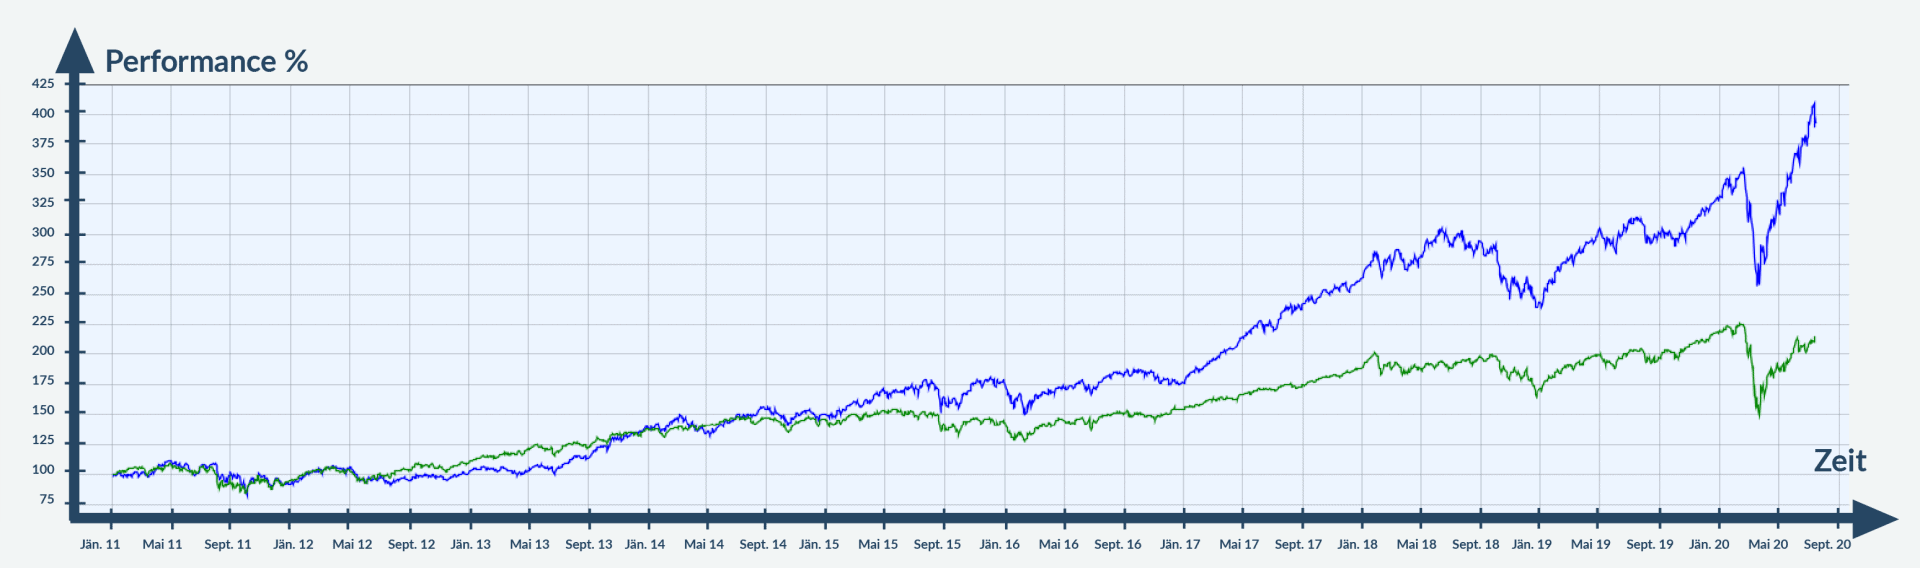 Chart - MSCI vs. Morgan Stanley